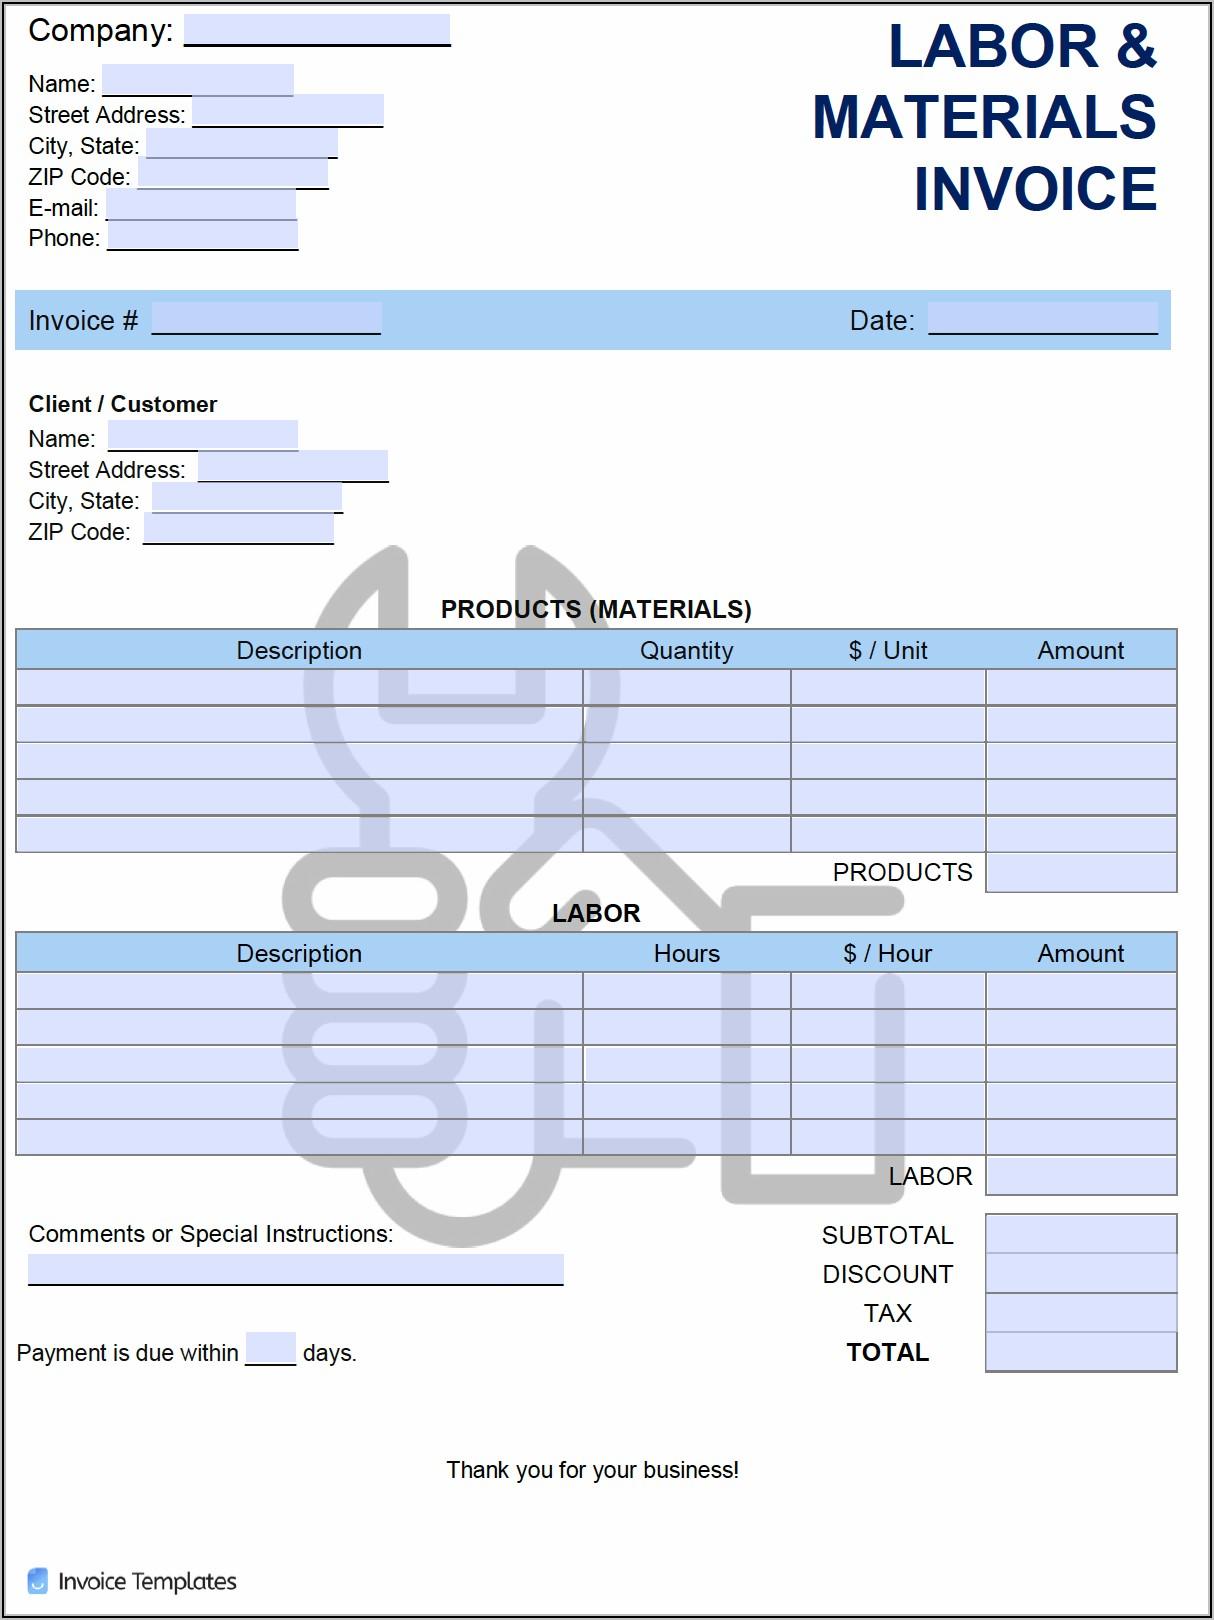 Labor Invoice Template Word